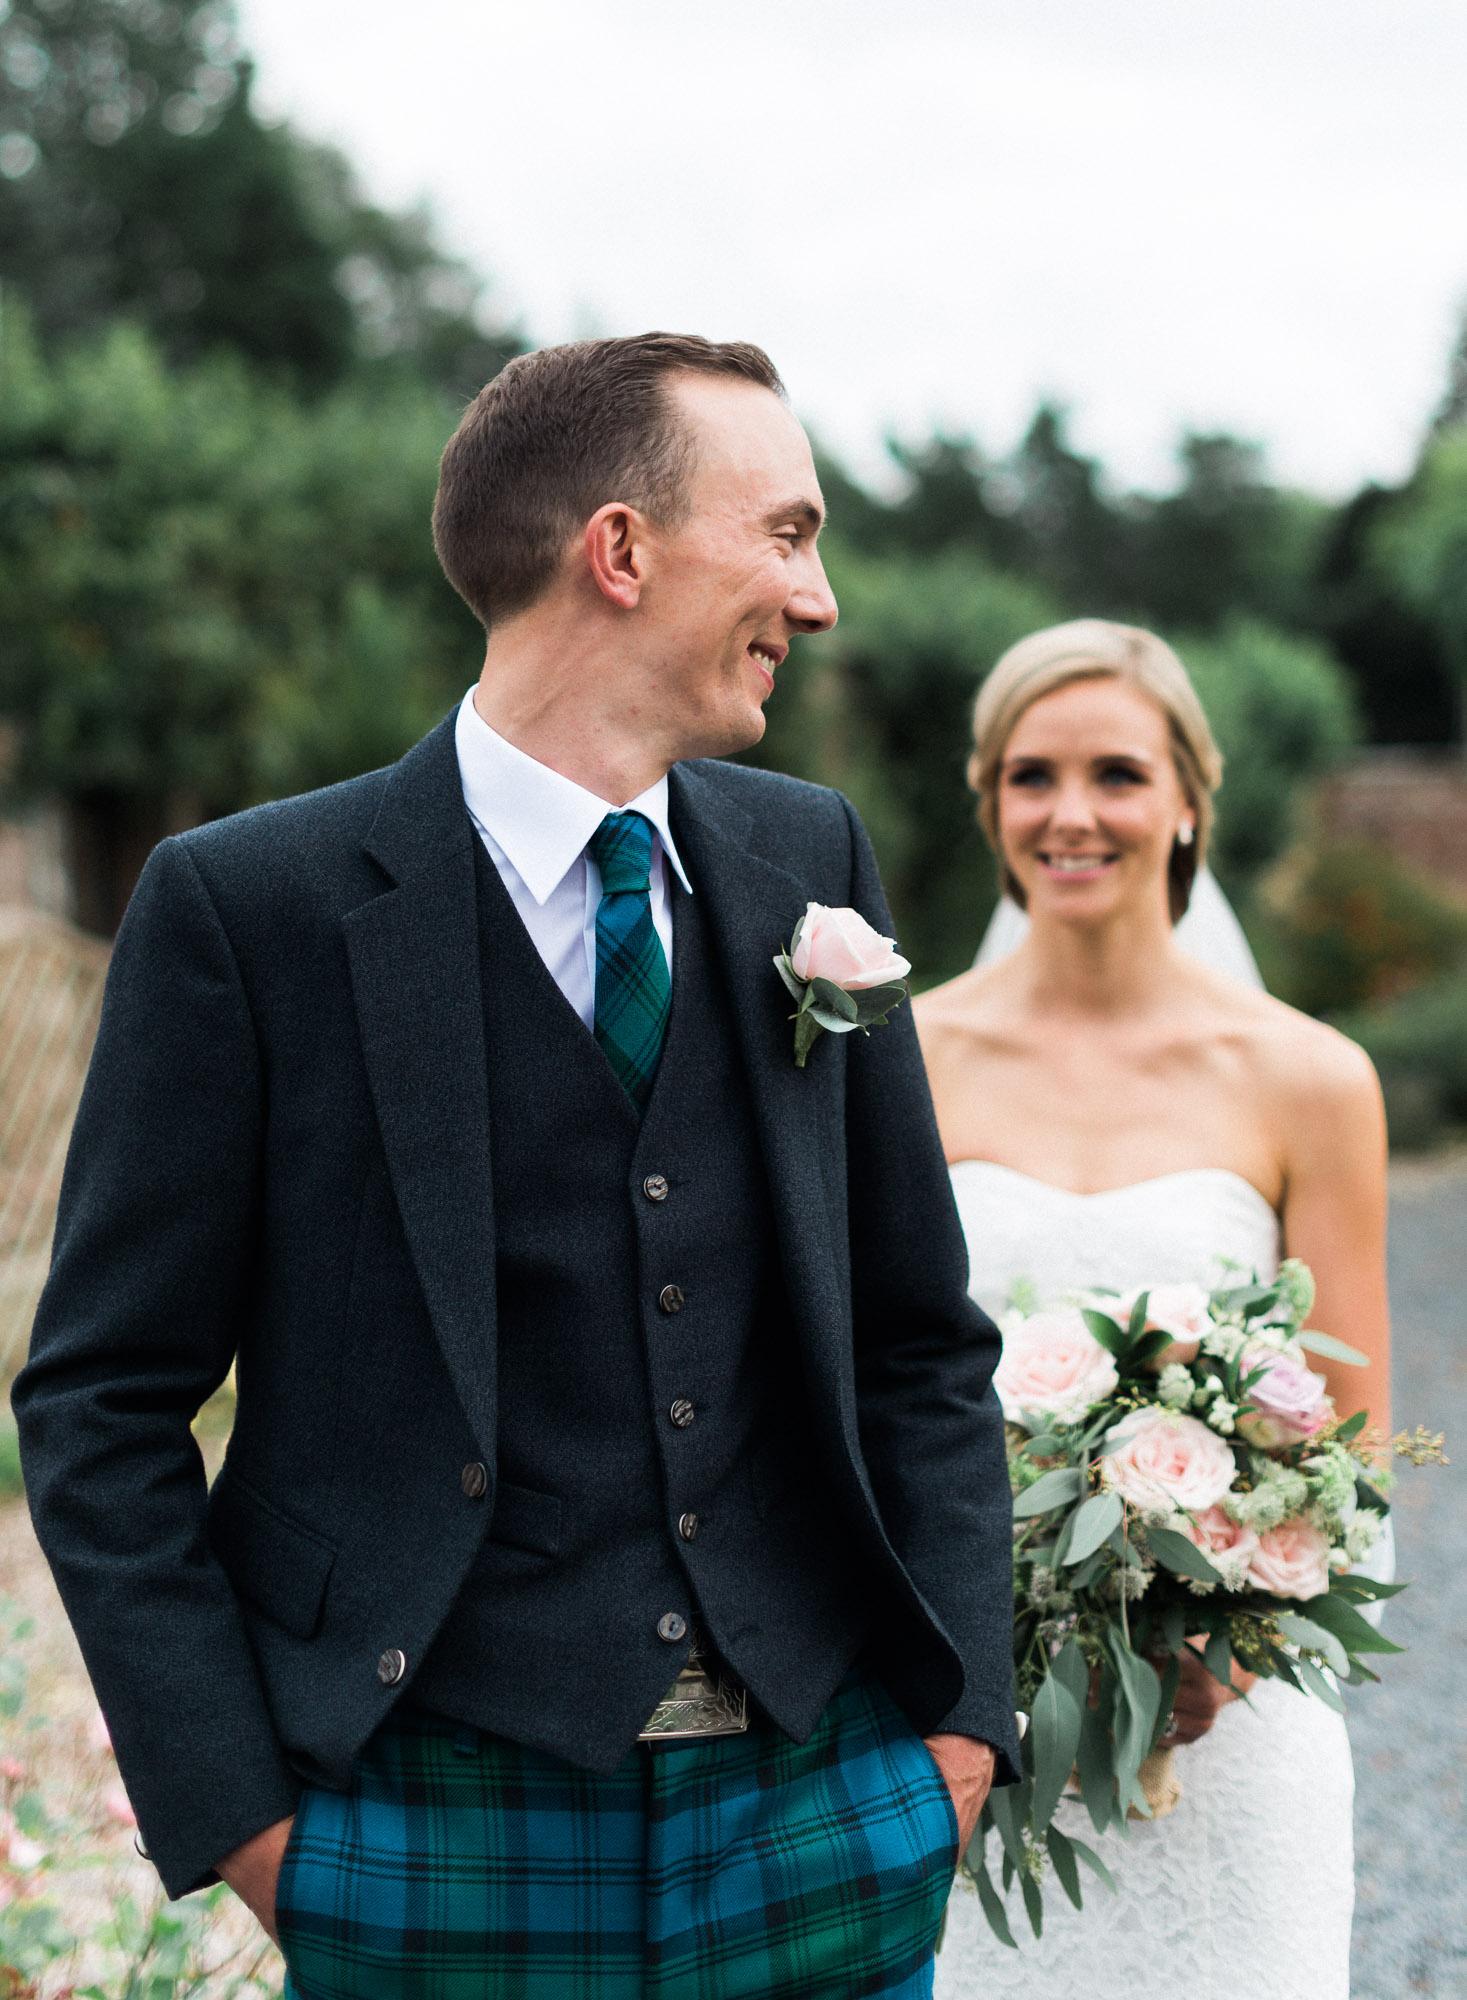 scottish_wedding_blairquhan_castle-42.jpg